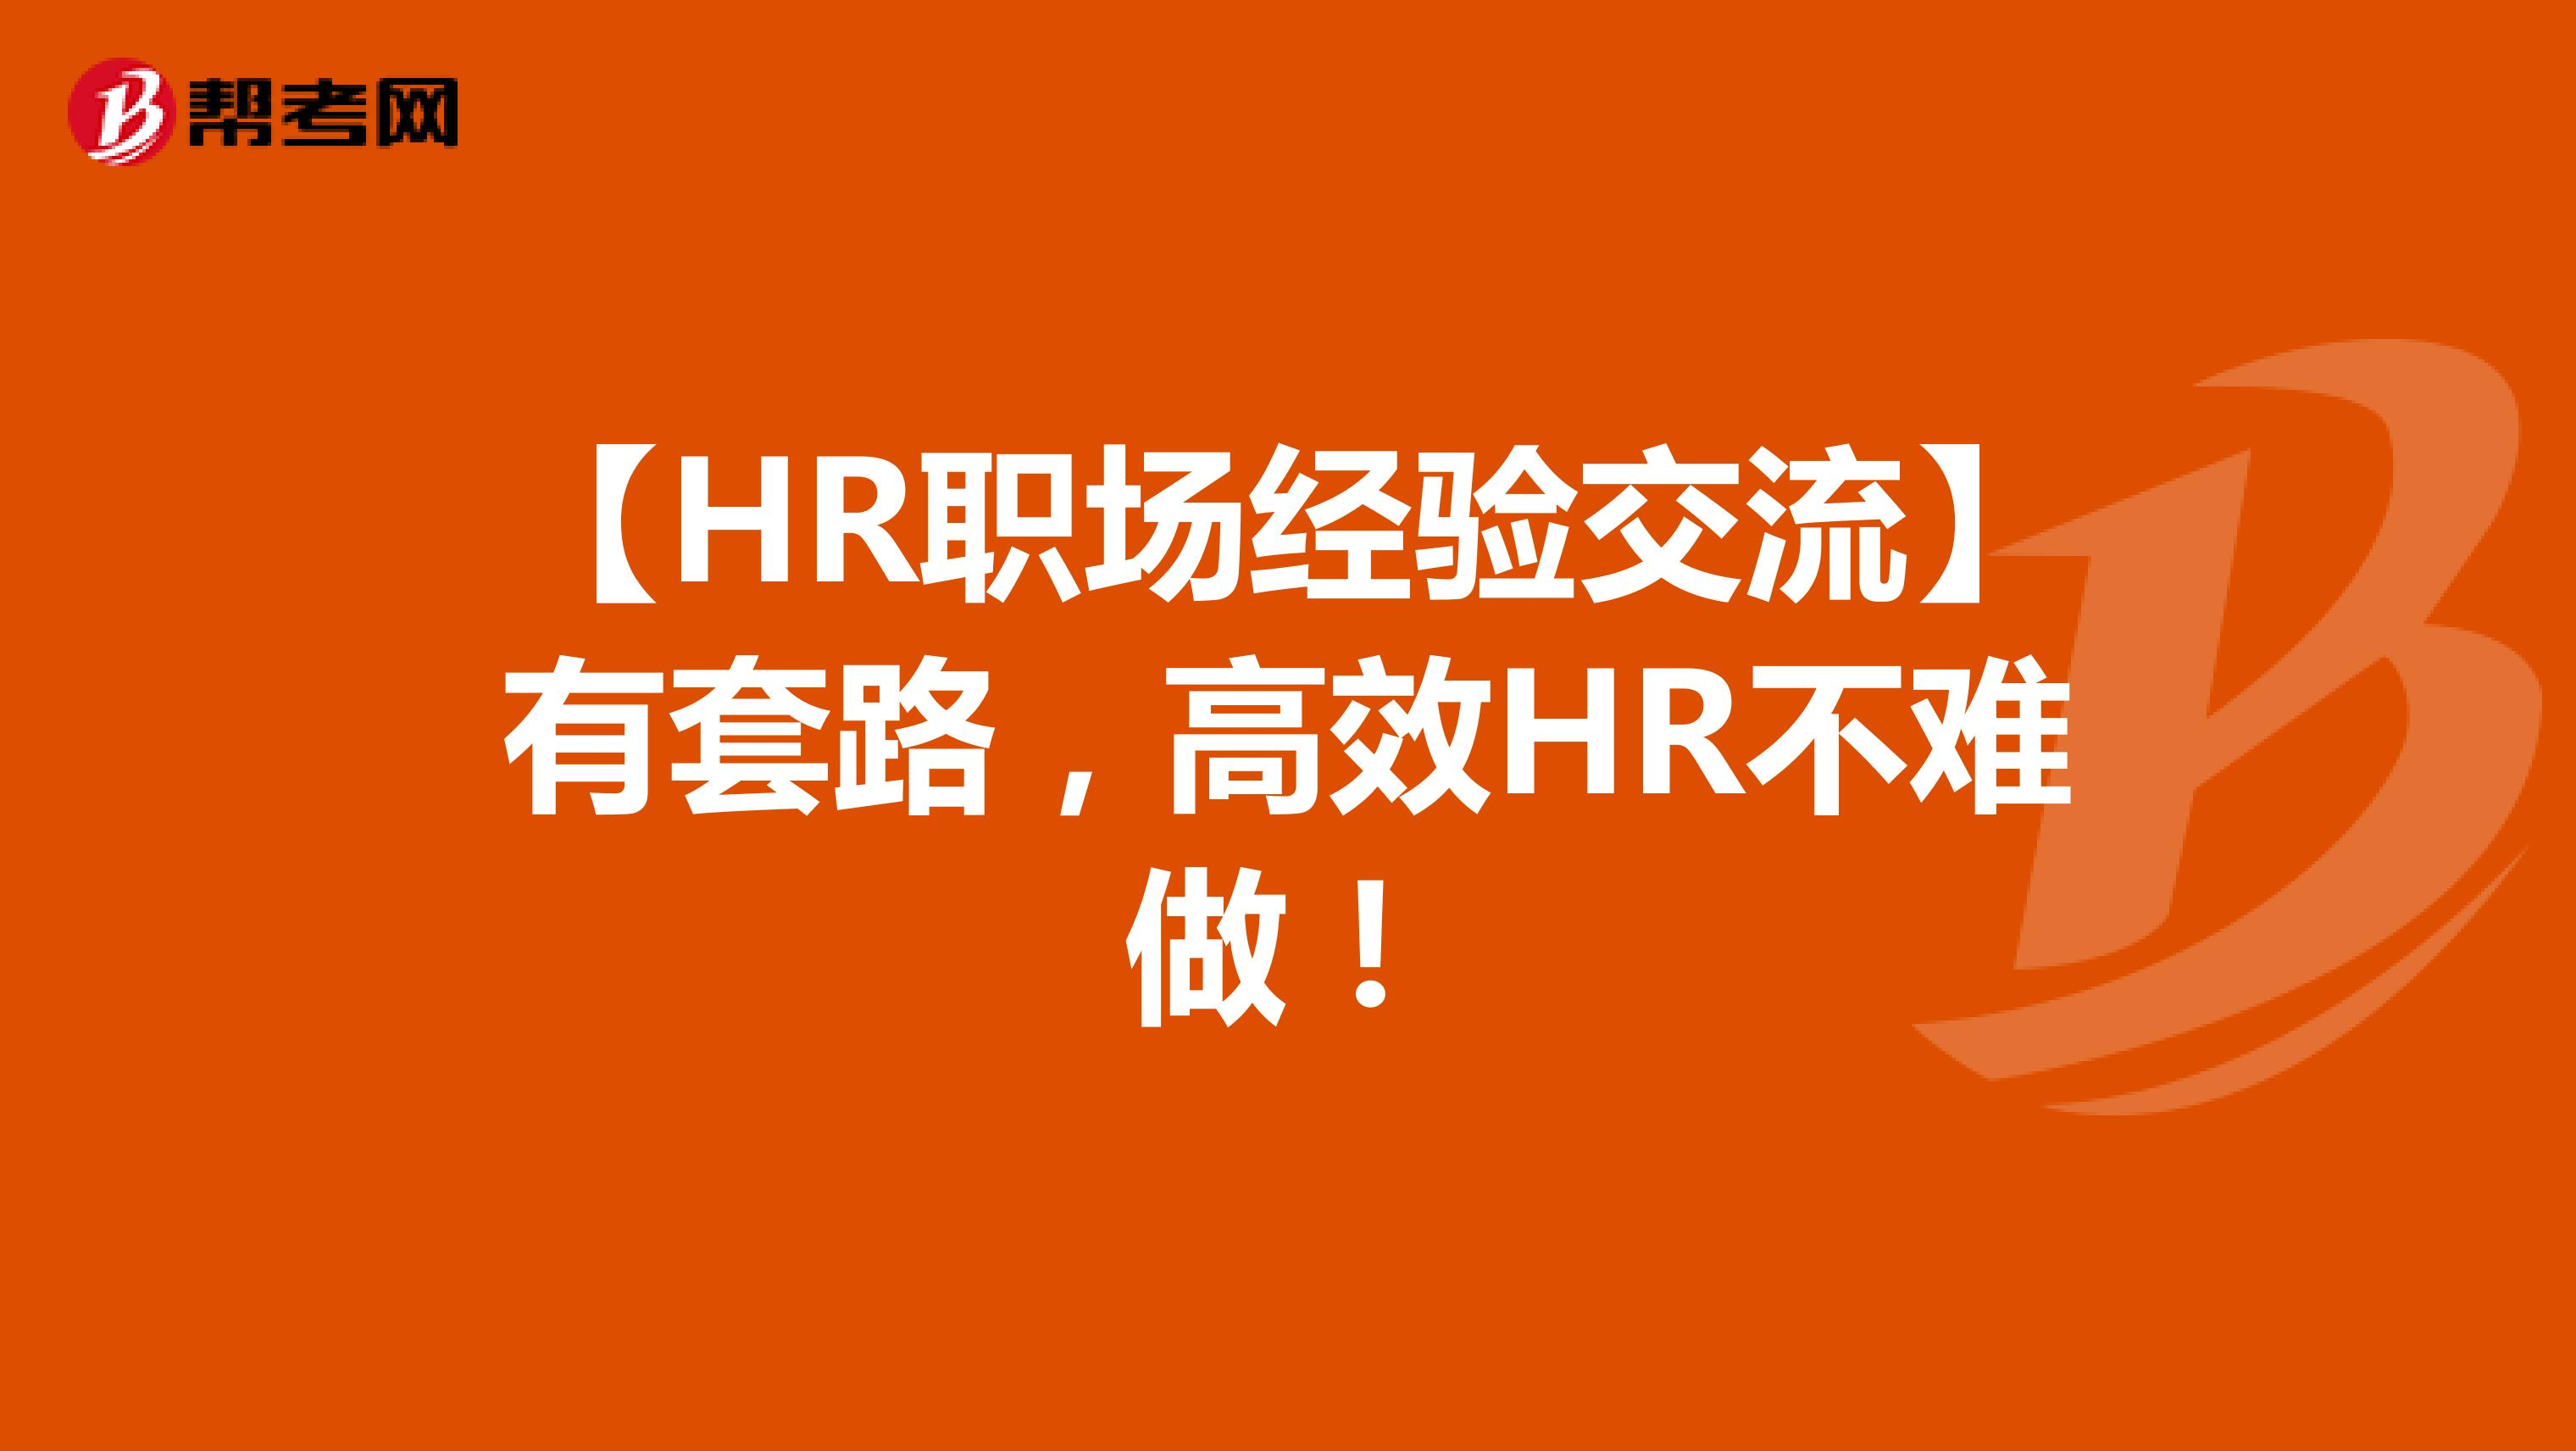 【HR职场经验交流】有套路,高效HR不难做!